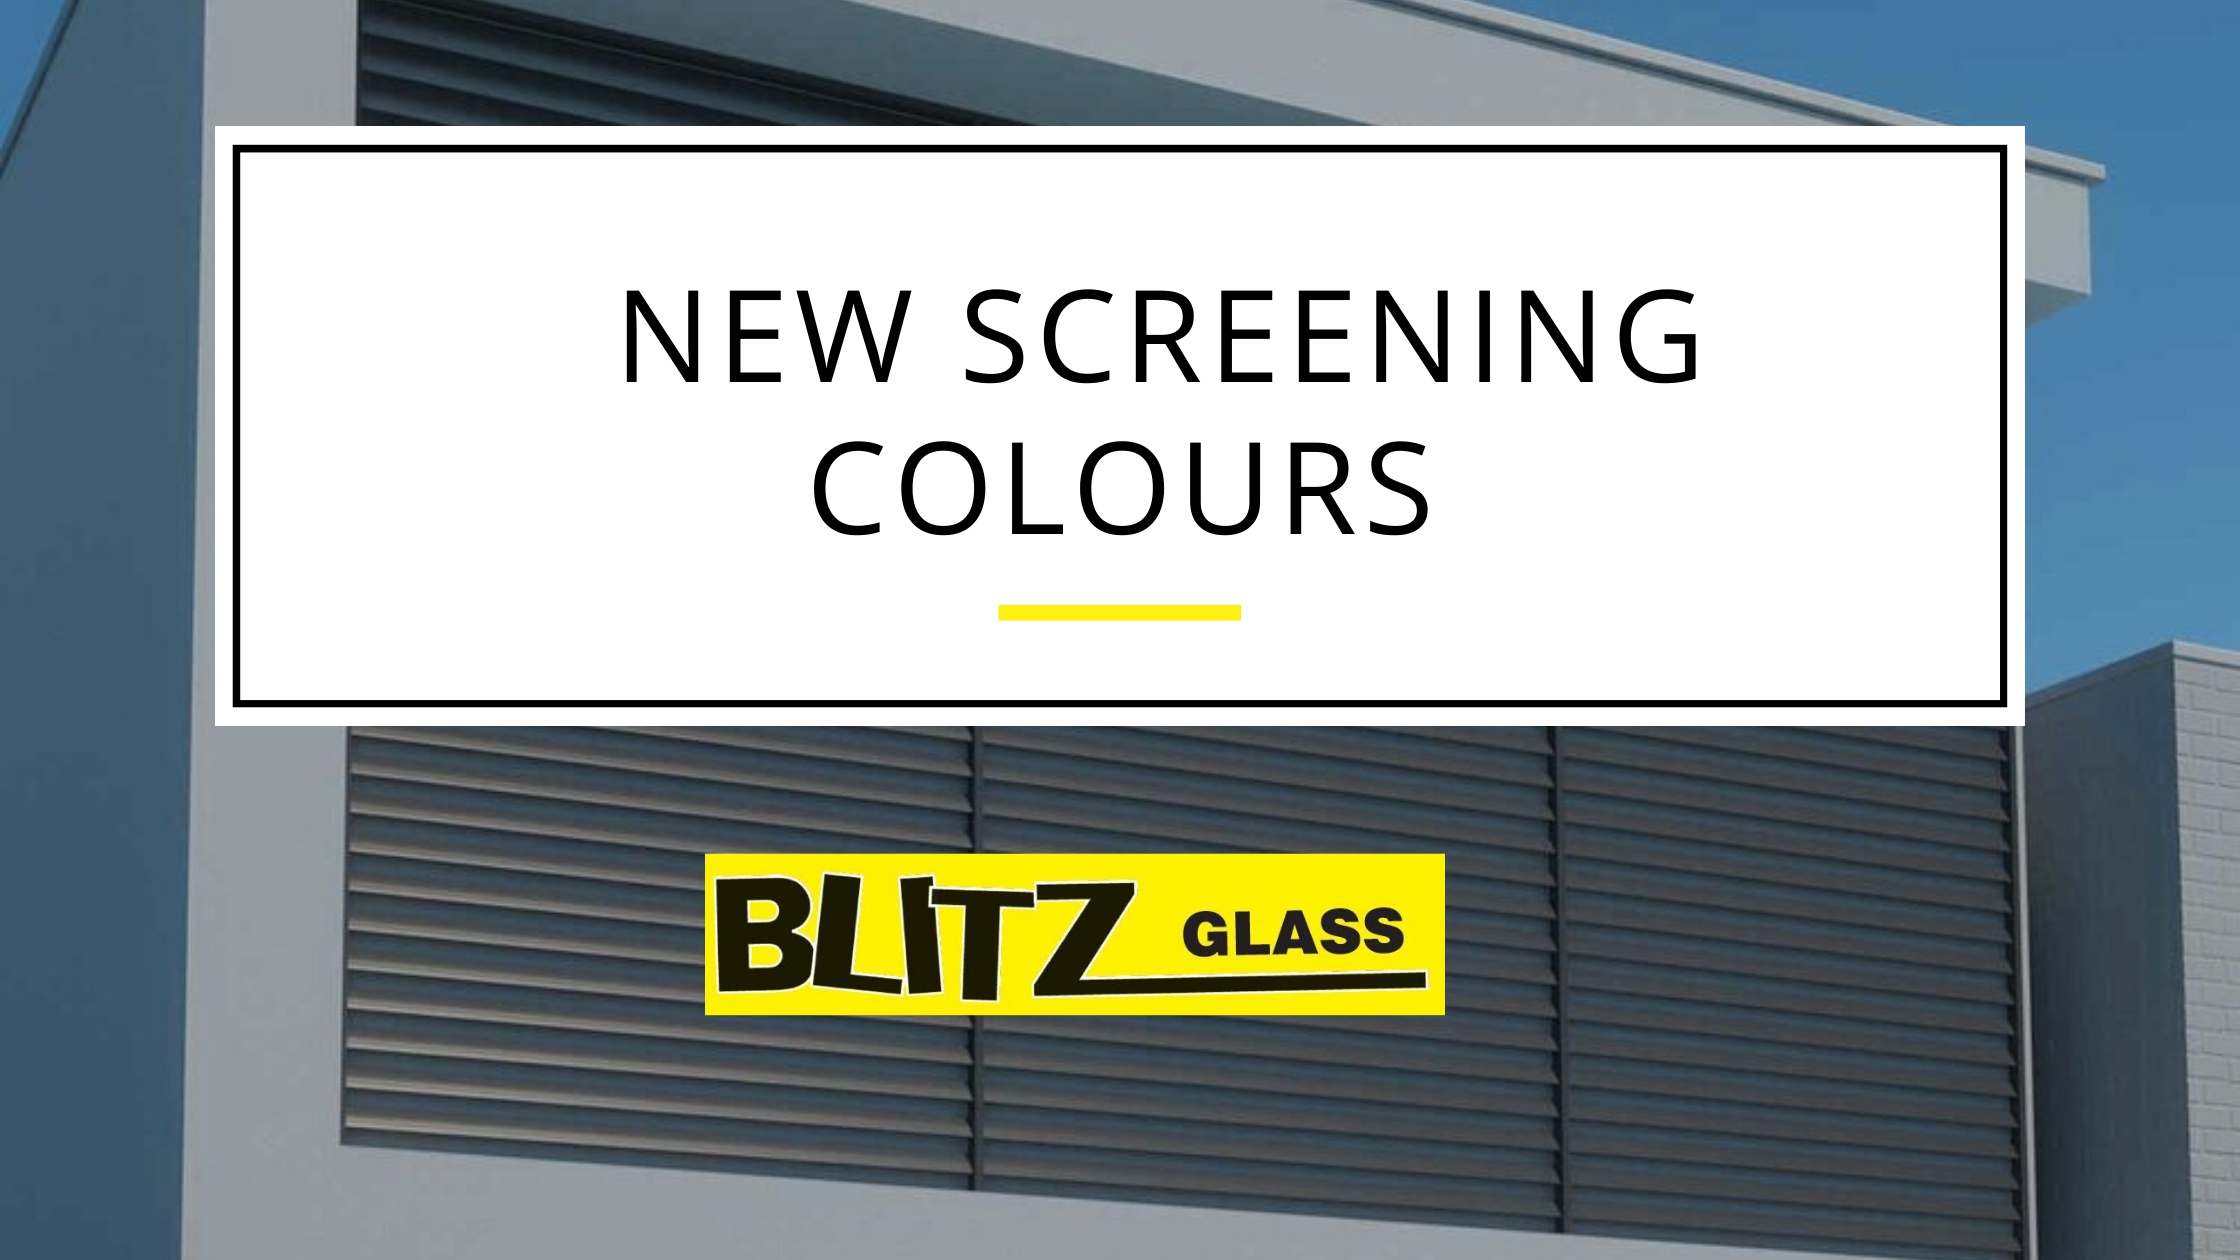 Blog - New Screening Colours